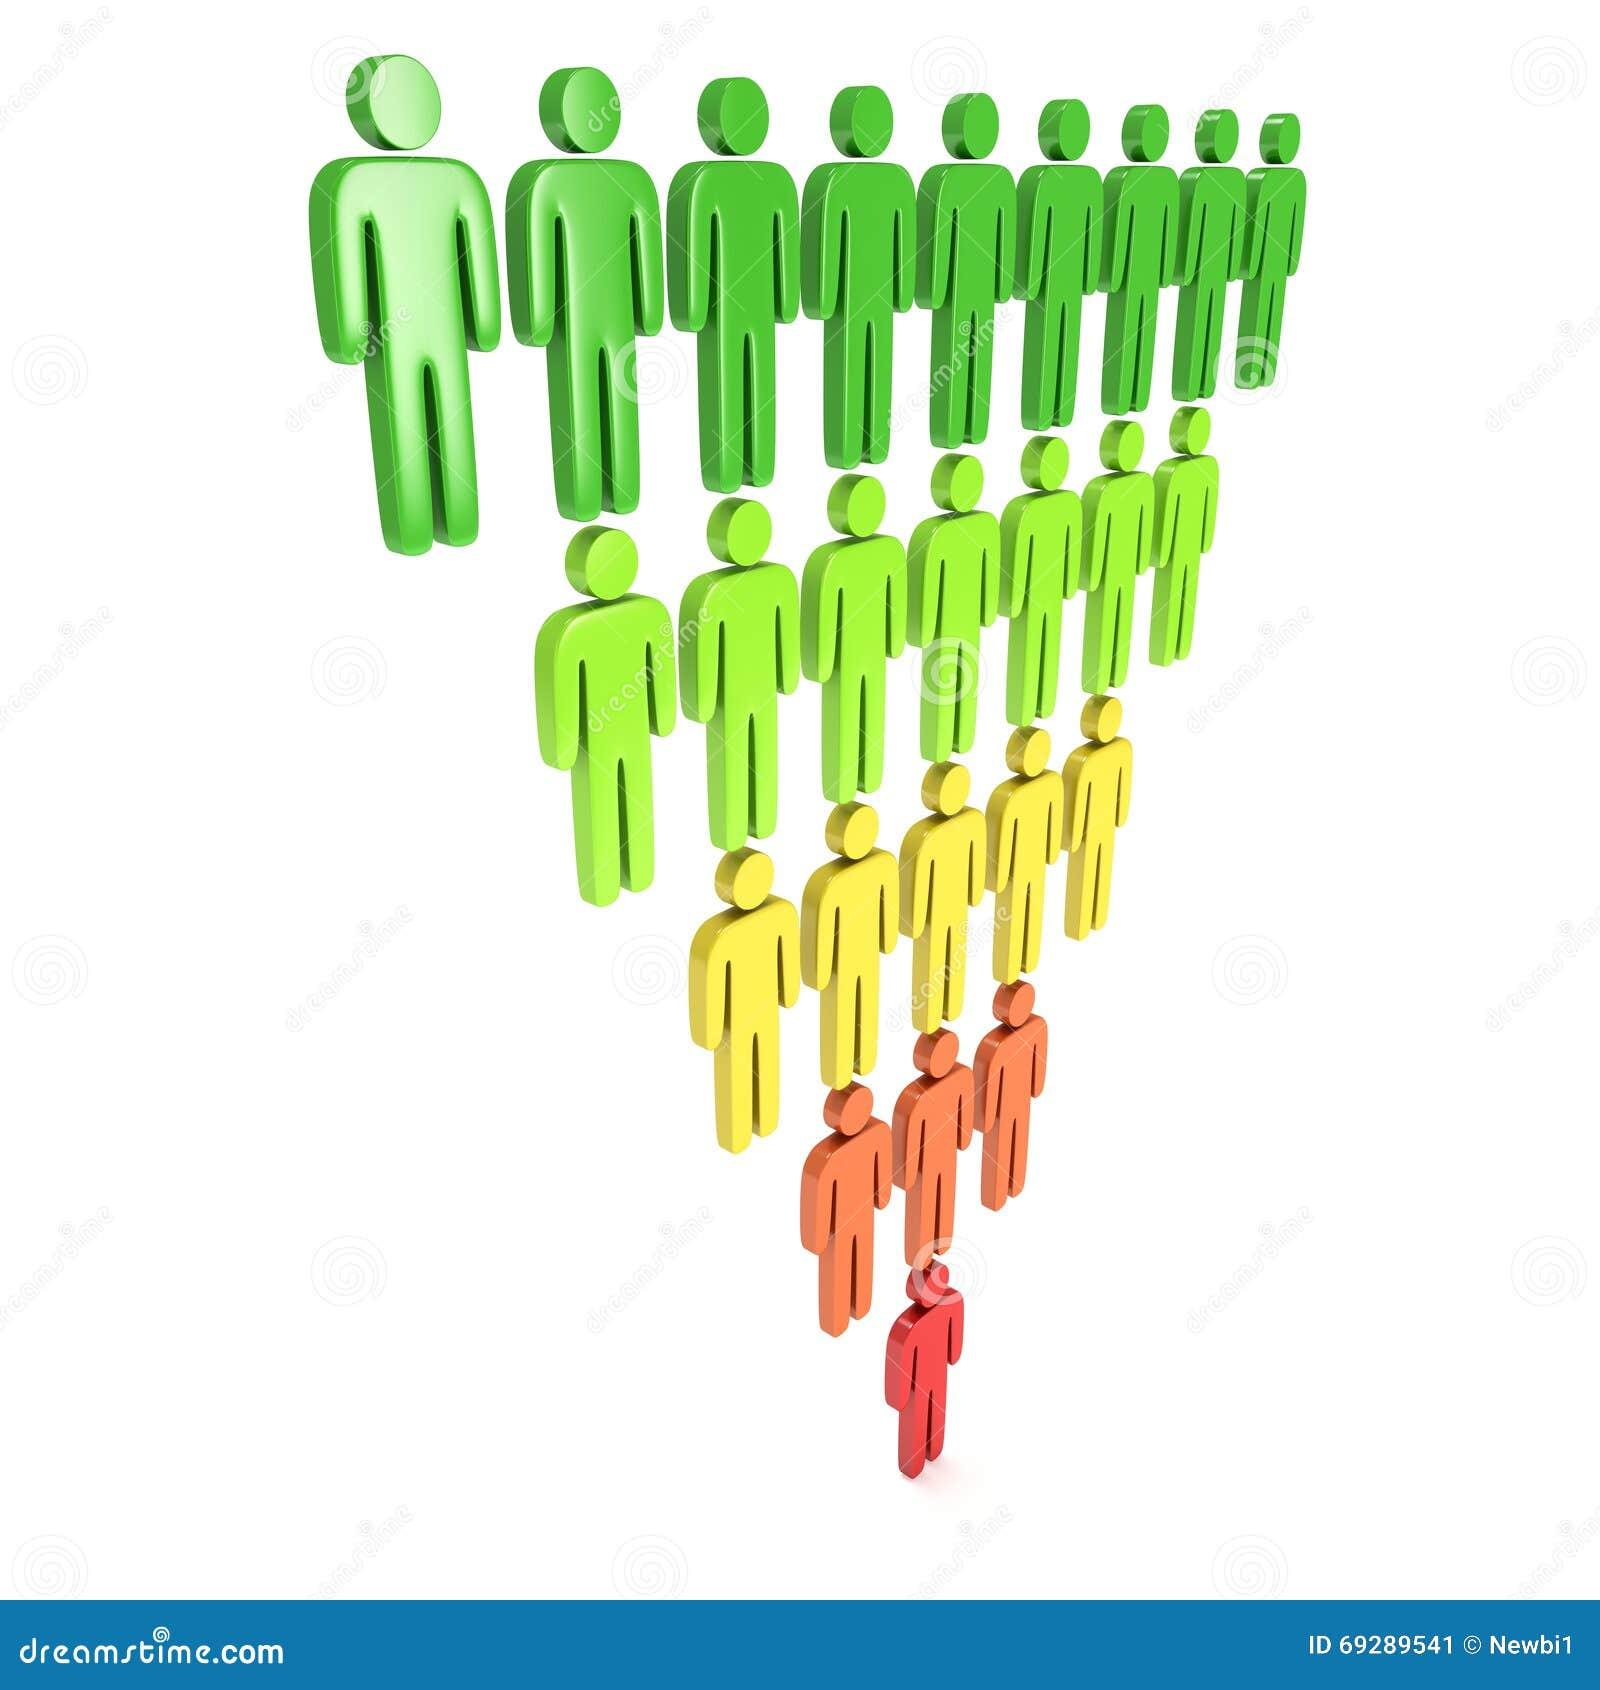 Marketing Sales: Marketing Funnel Sales Stock Illustration. Image Of